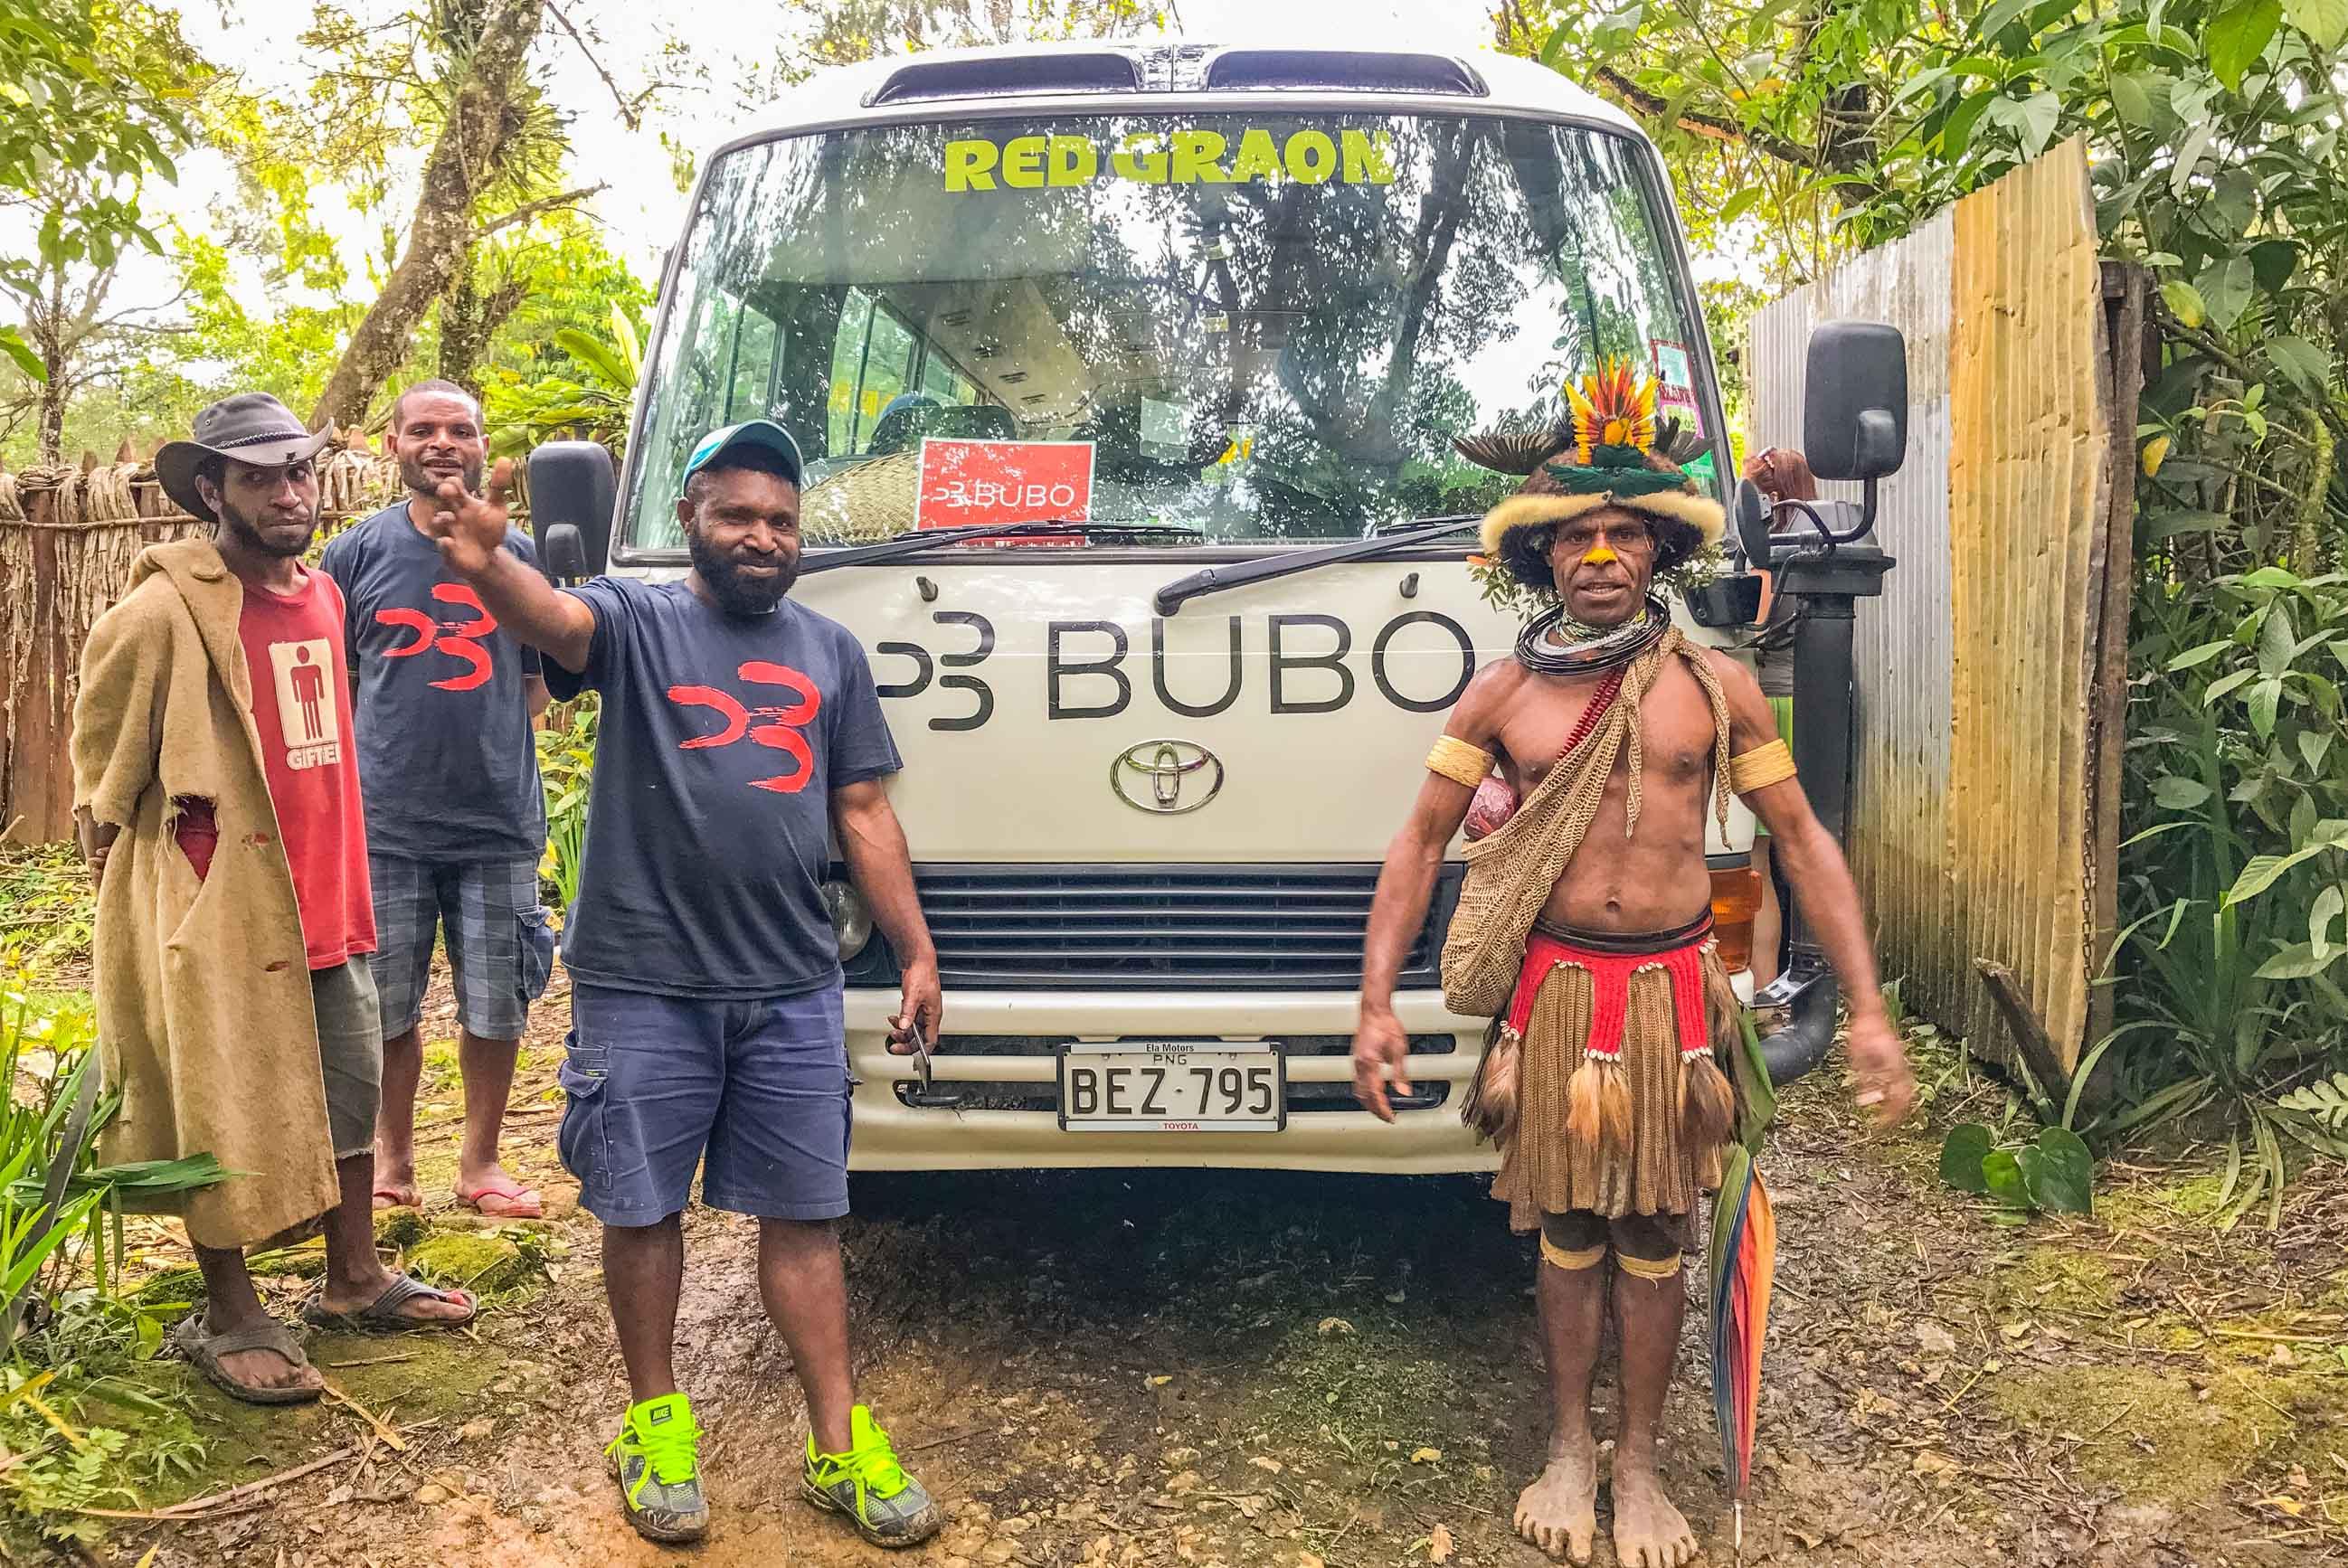 https://bubo.sk/uploads/galleries/7442/lubosfellner_papuanovaguinea_img_0164.jpg